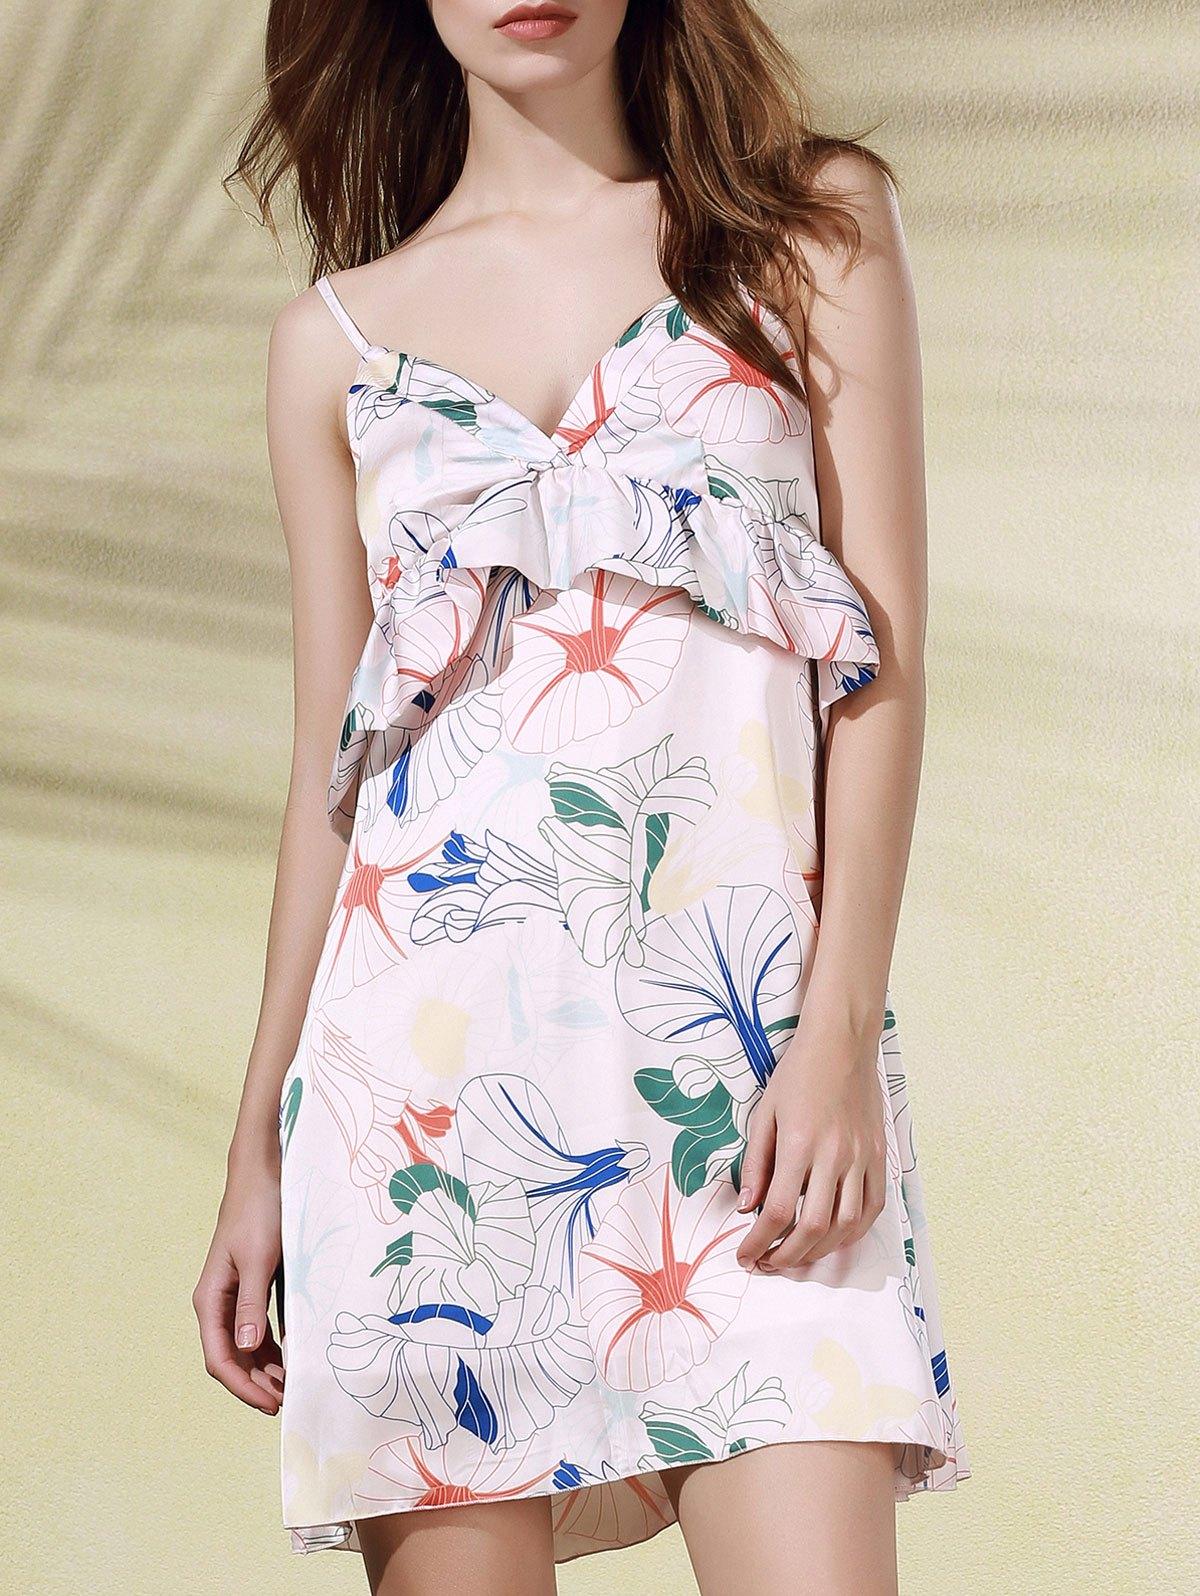 Floral Print Flounce Ruffles Cami Sleeveless Dress